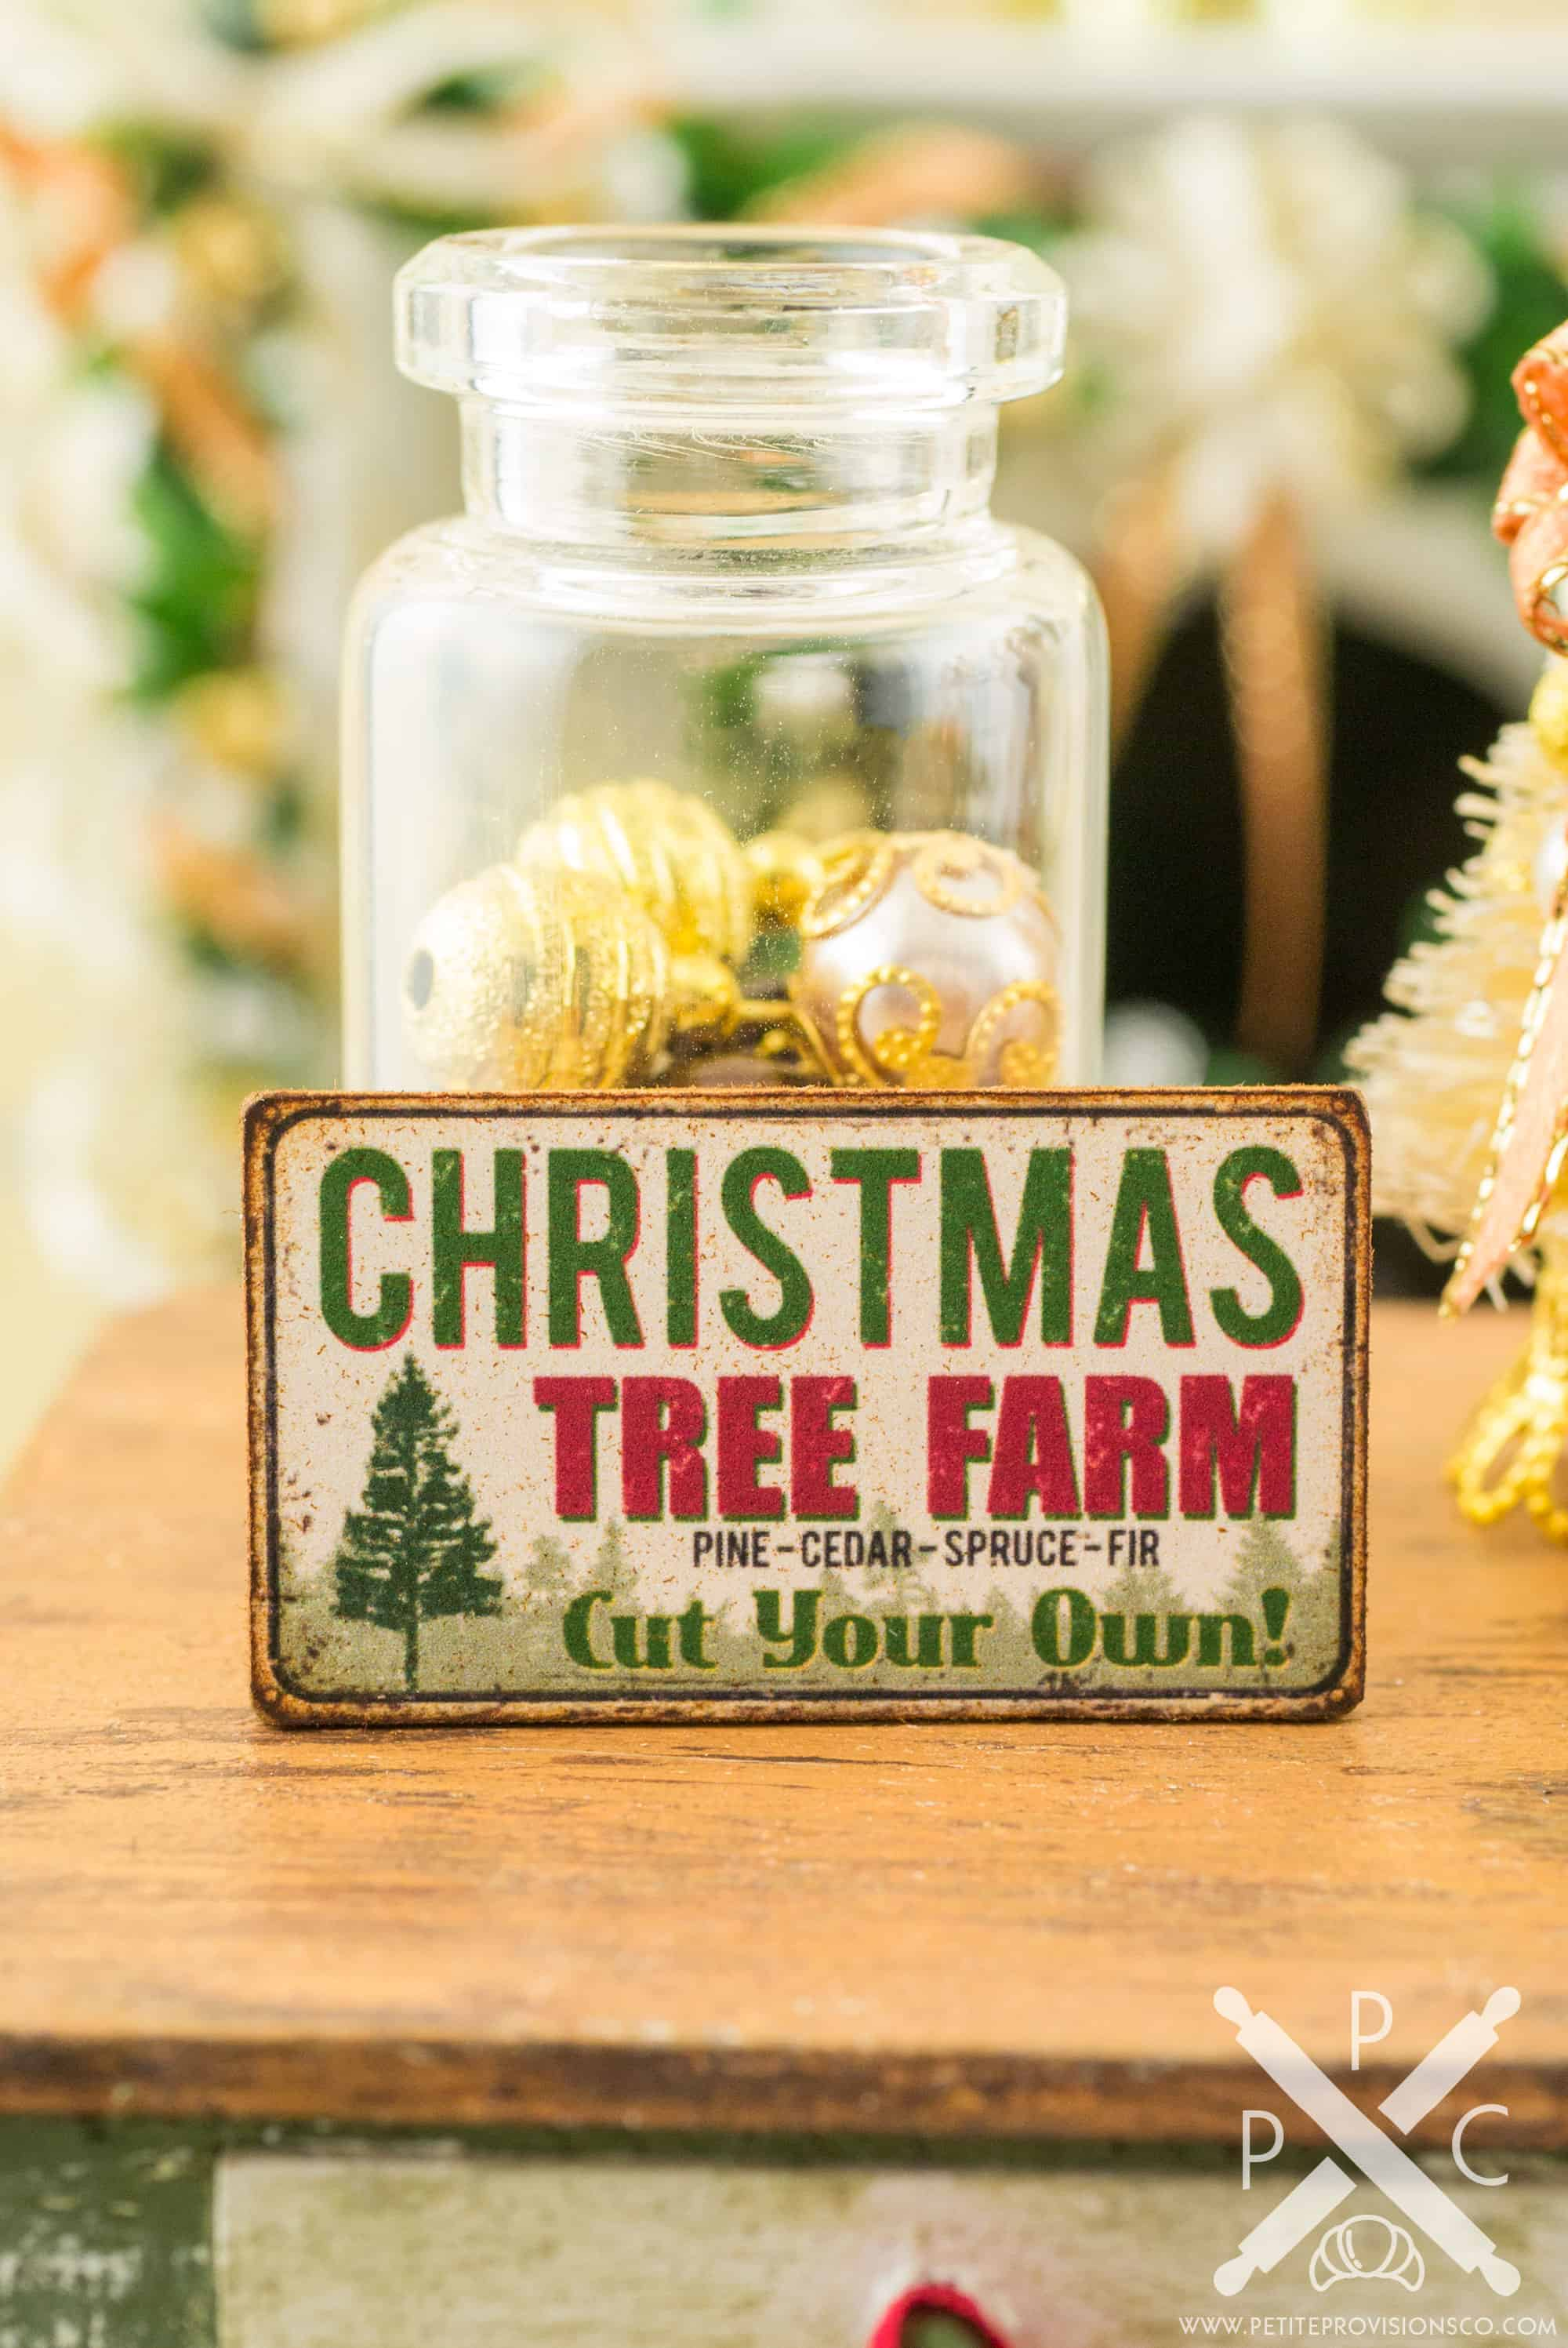 Dollhouse Miniature Christmas Tree Farm Sign Decorative Christmas